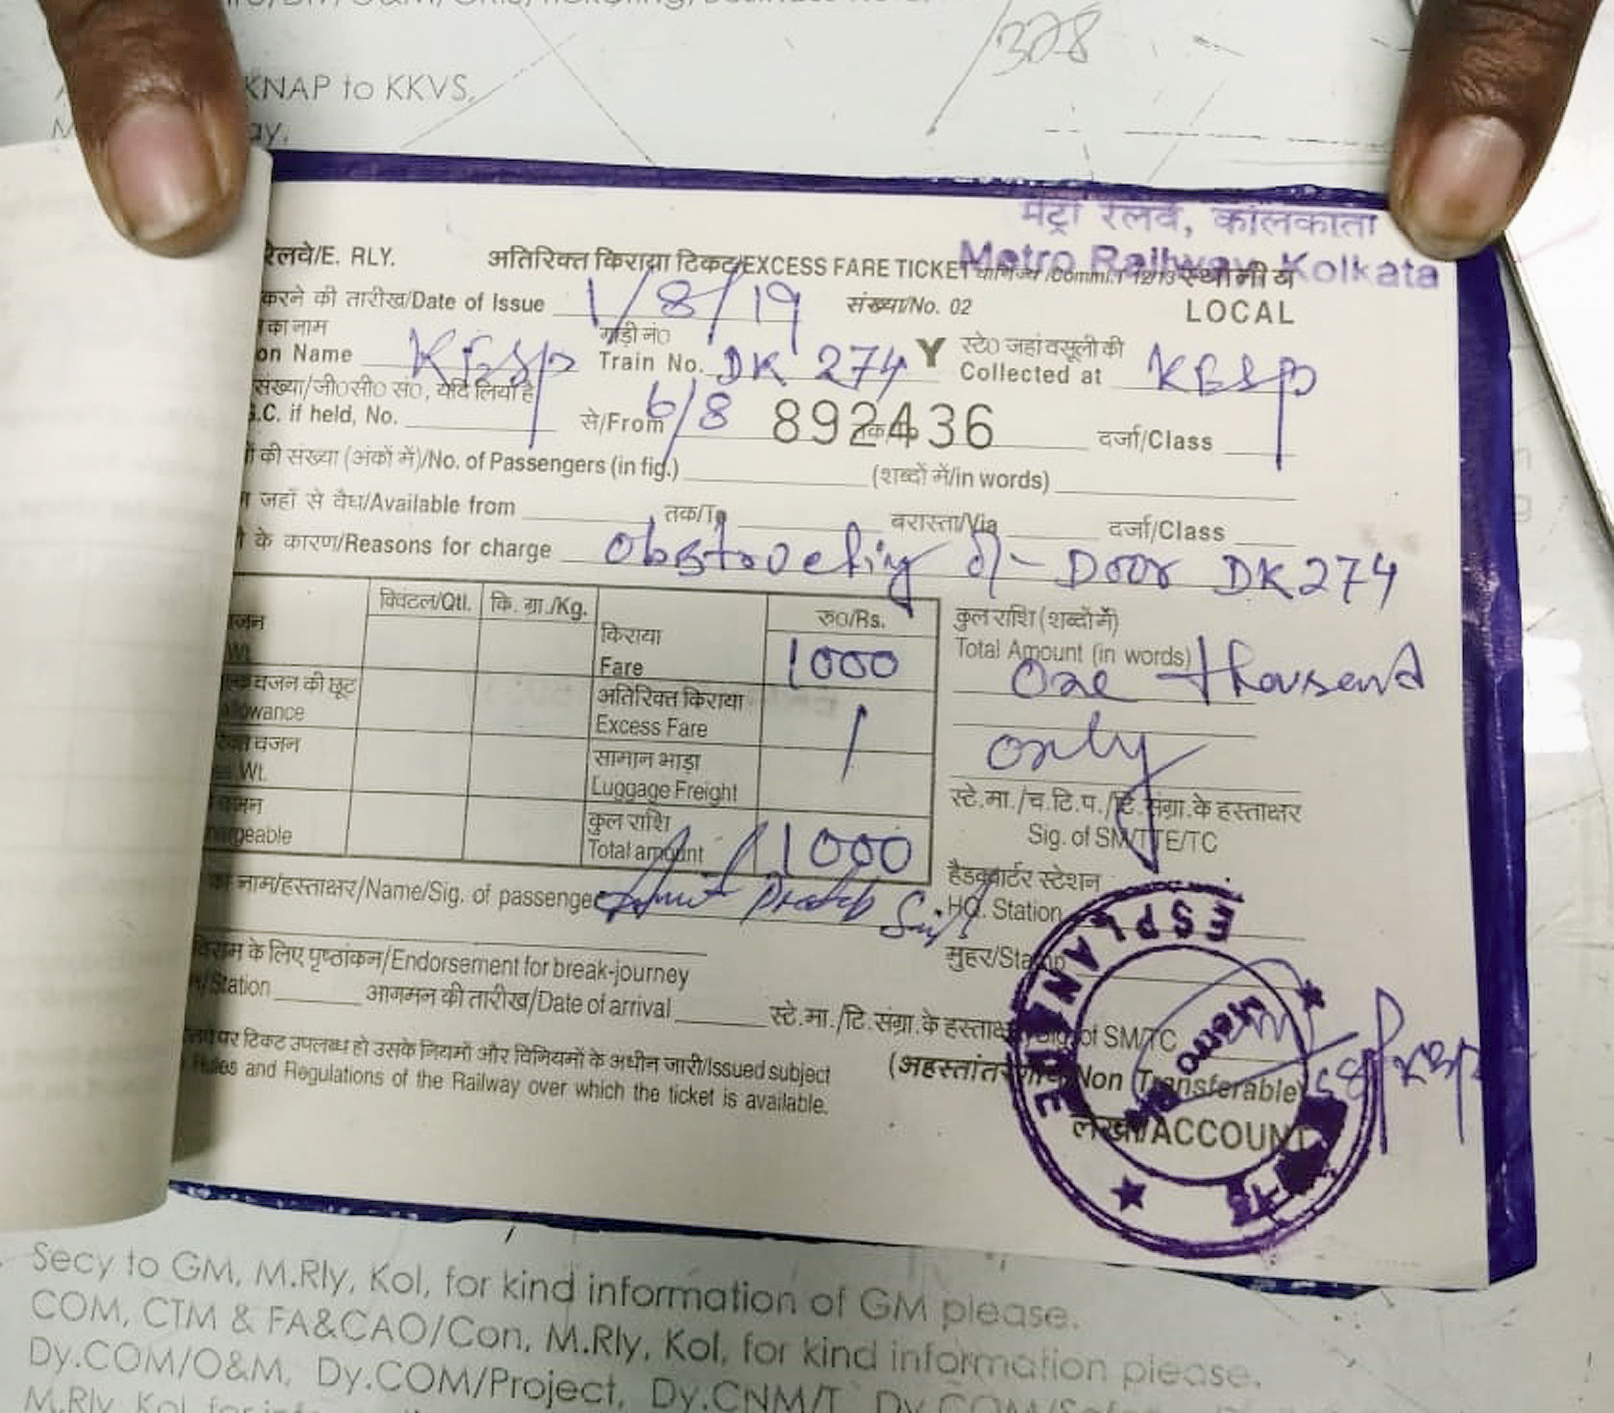 The challan issued to Amit Pratap Singh.